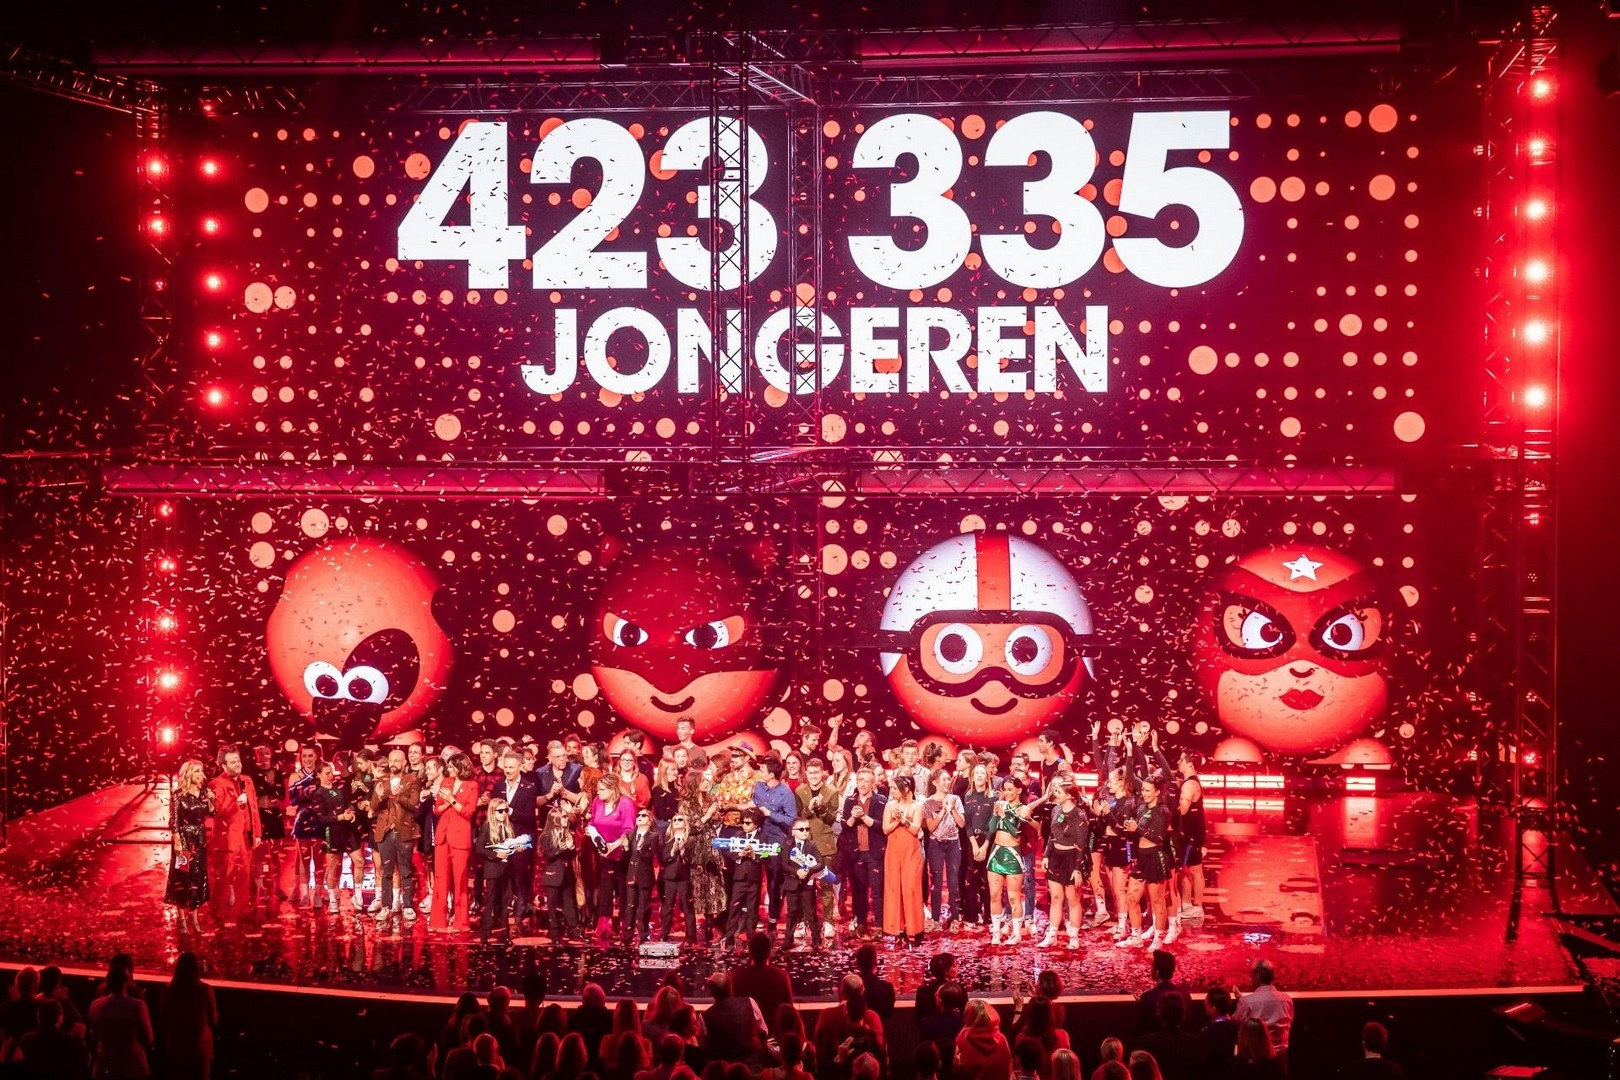 Rode Neuzen Dag 2019 maakt 423.335 jongeren sterker - Rode Neuzen dag 2019 1